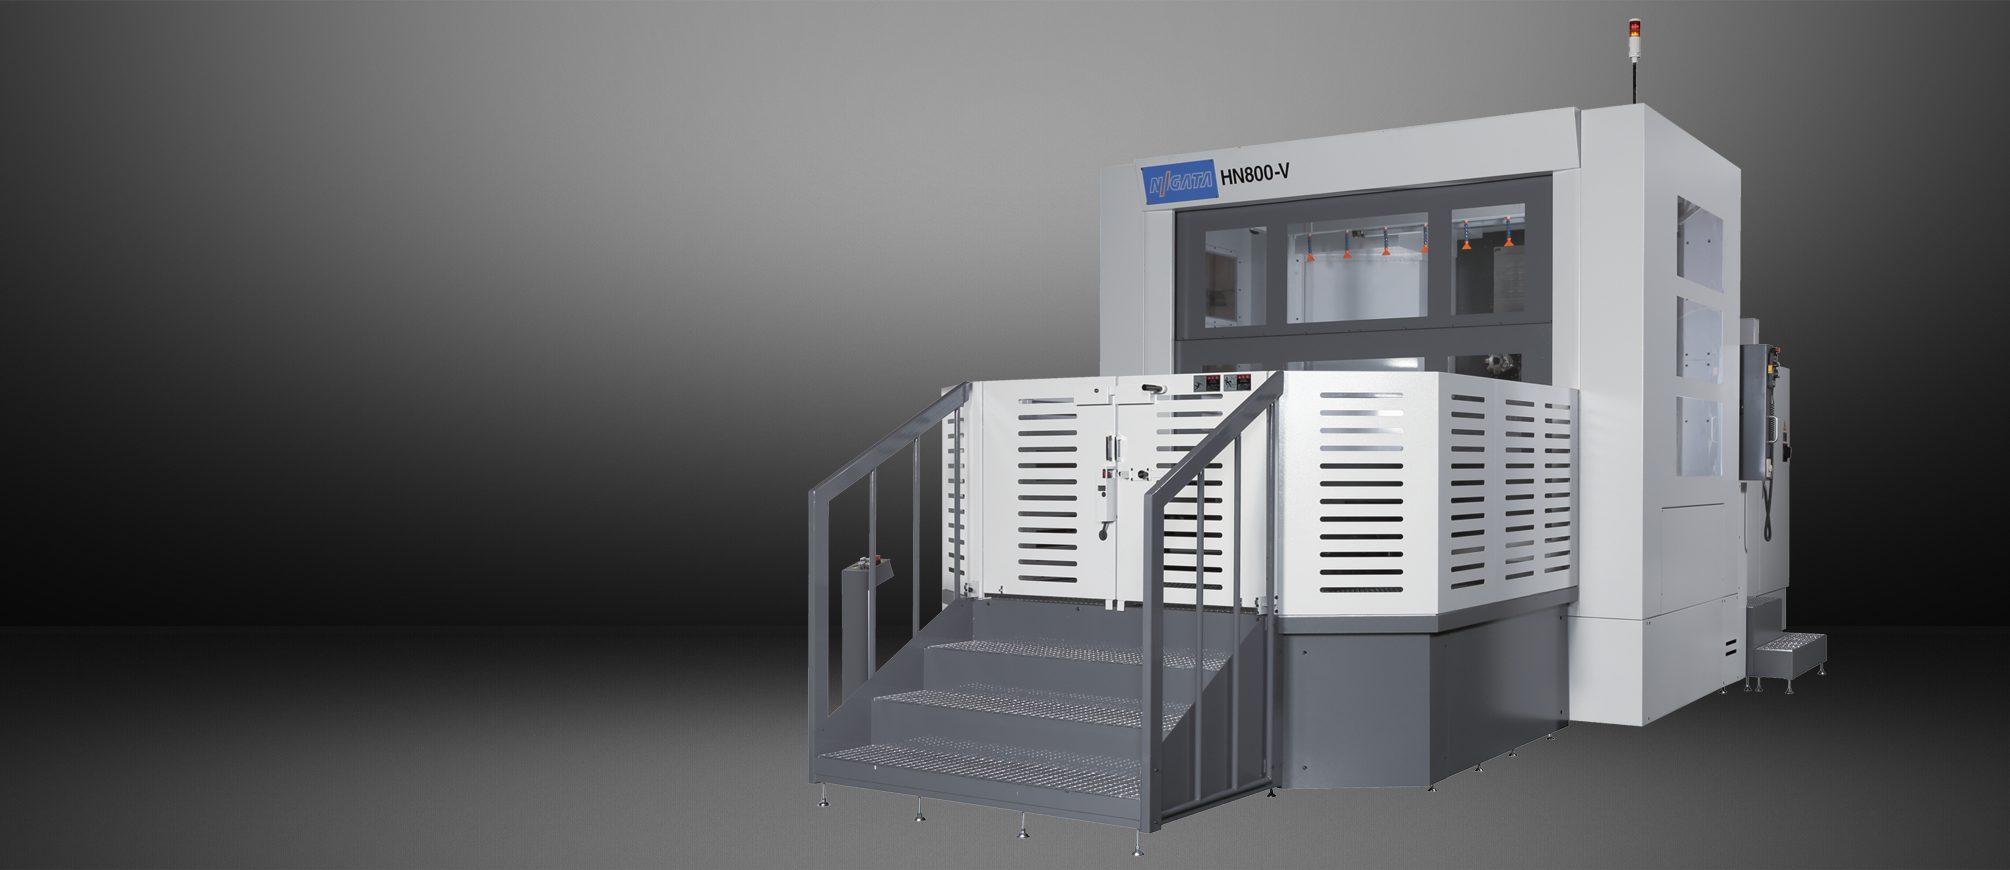 HN800-V Horizontal Machining Centers